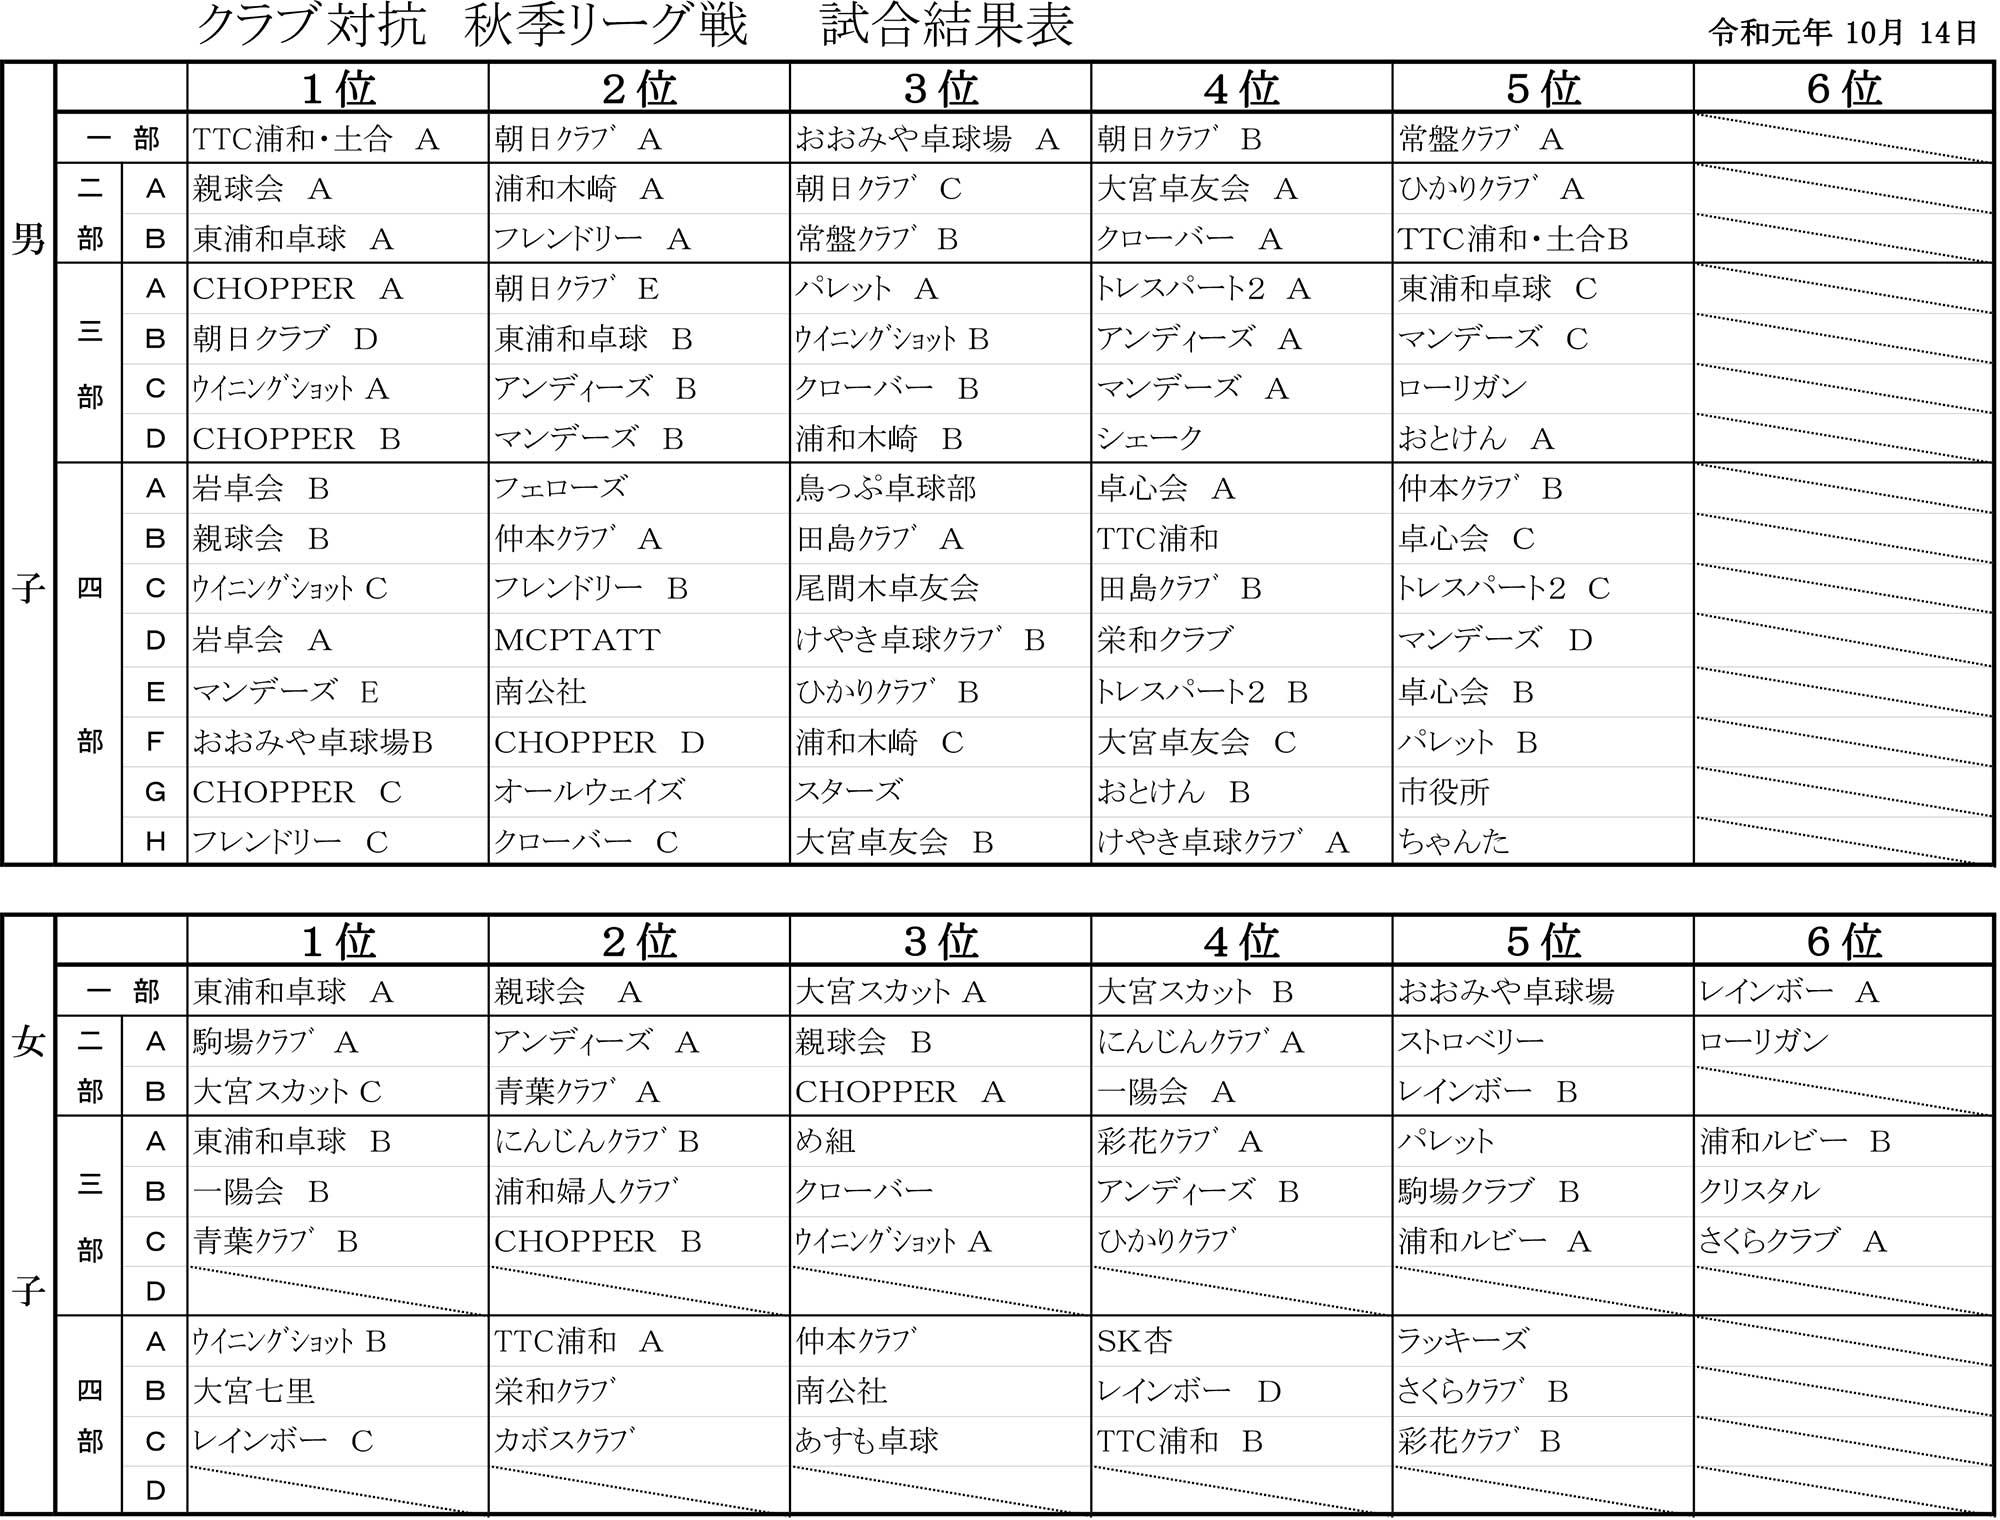 R元秋季リーグ-結果表10